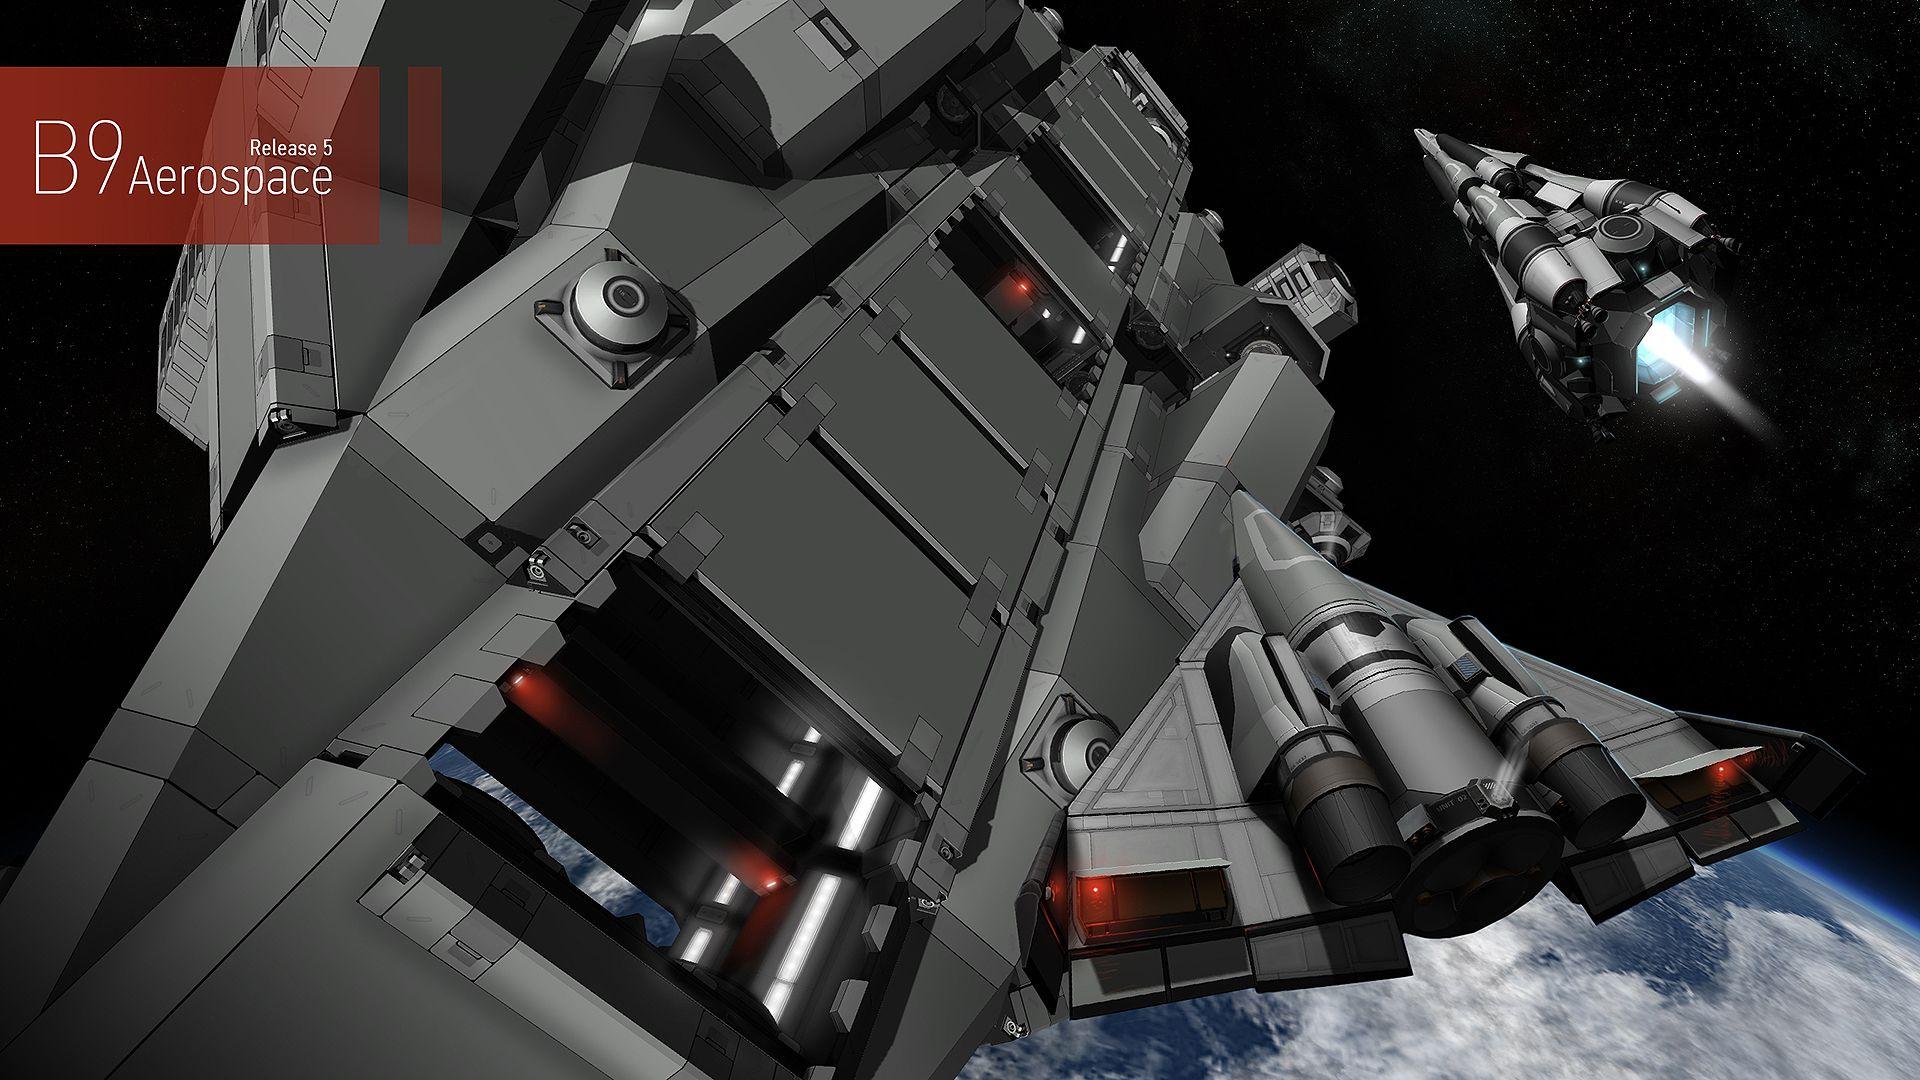 B9 Aerospace 5 2 8 Kerbal Space Program Space Program Aerospace